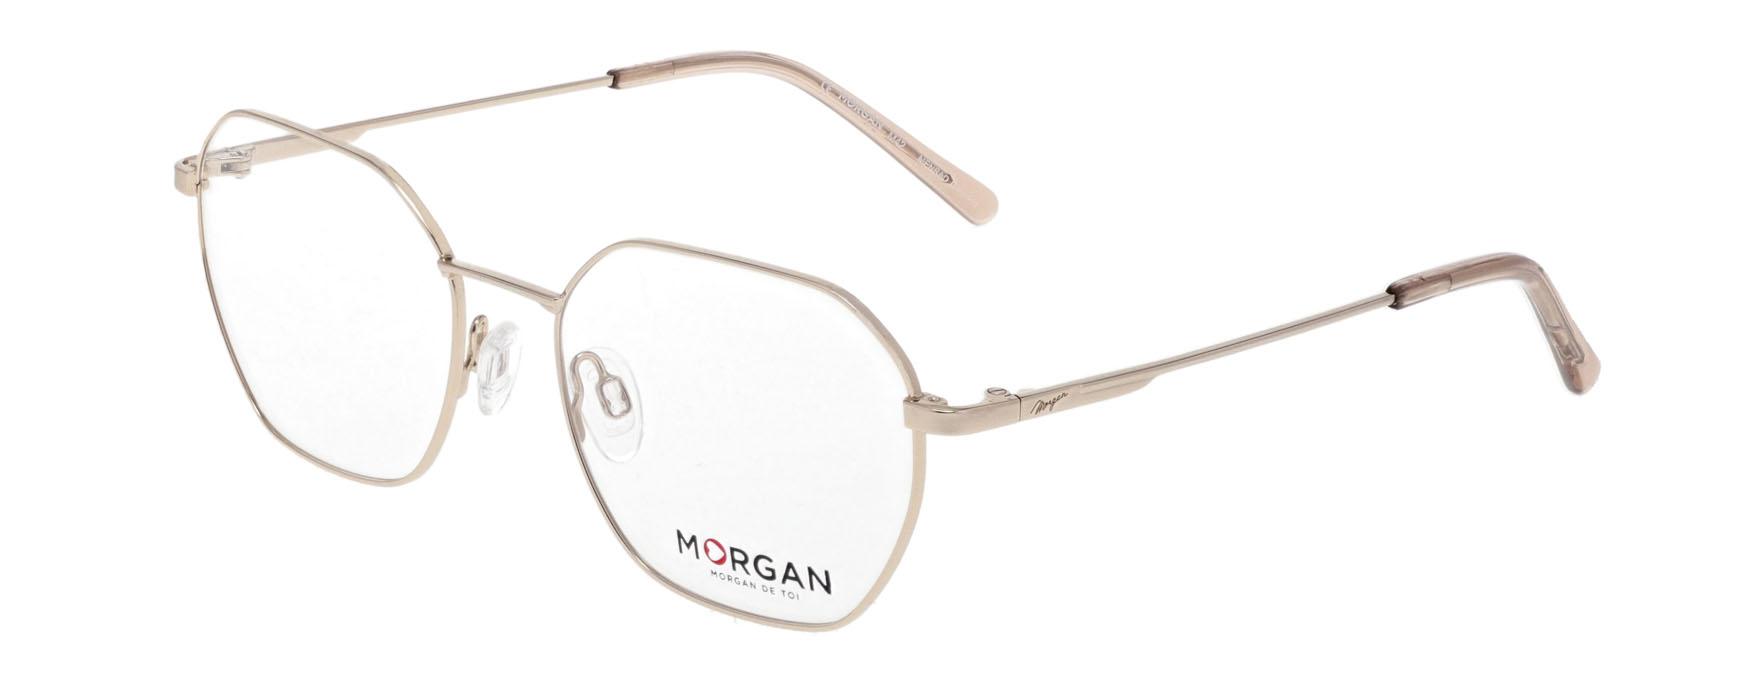 Morgan 203210 8100